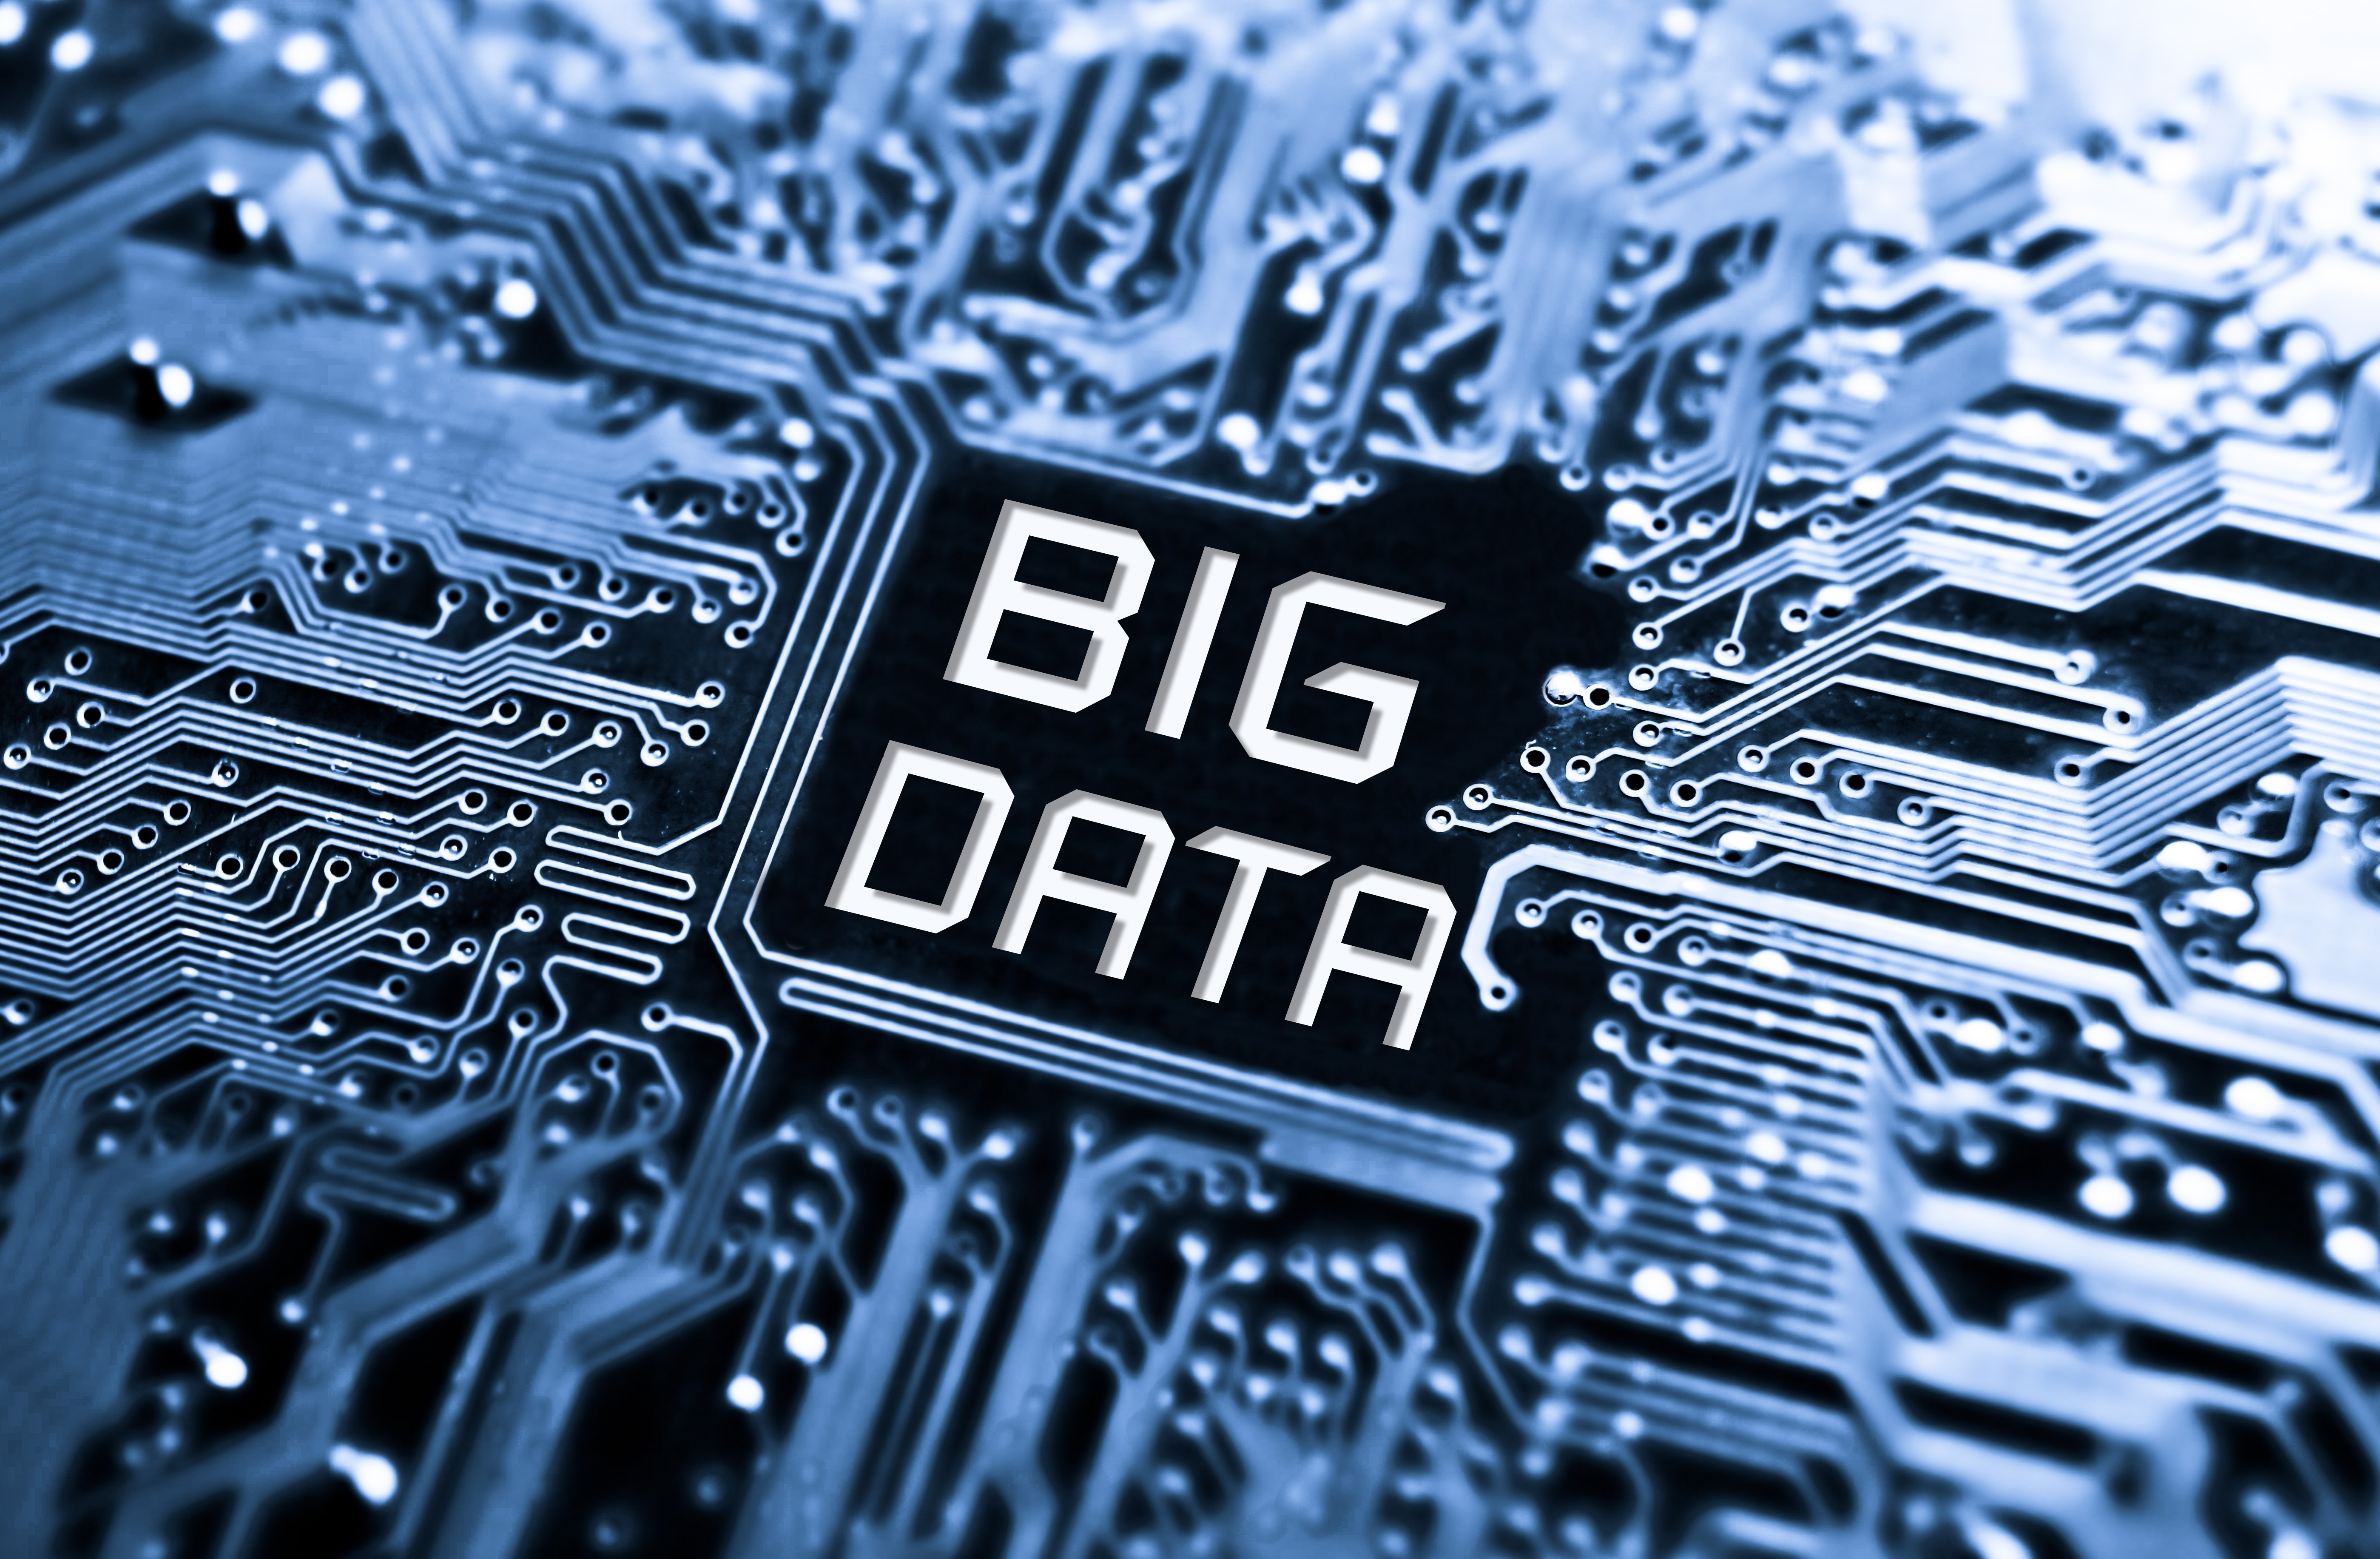 circuit board with word Big Data